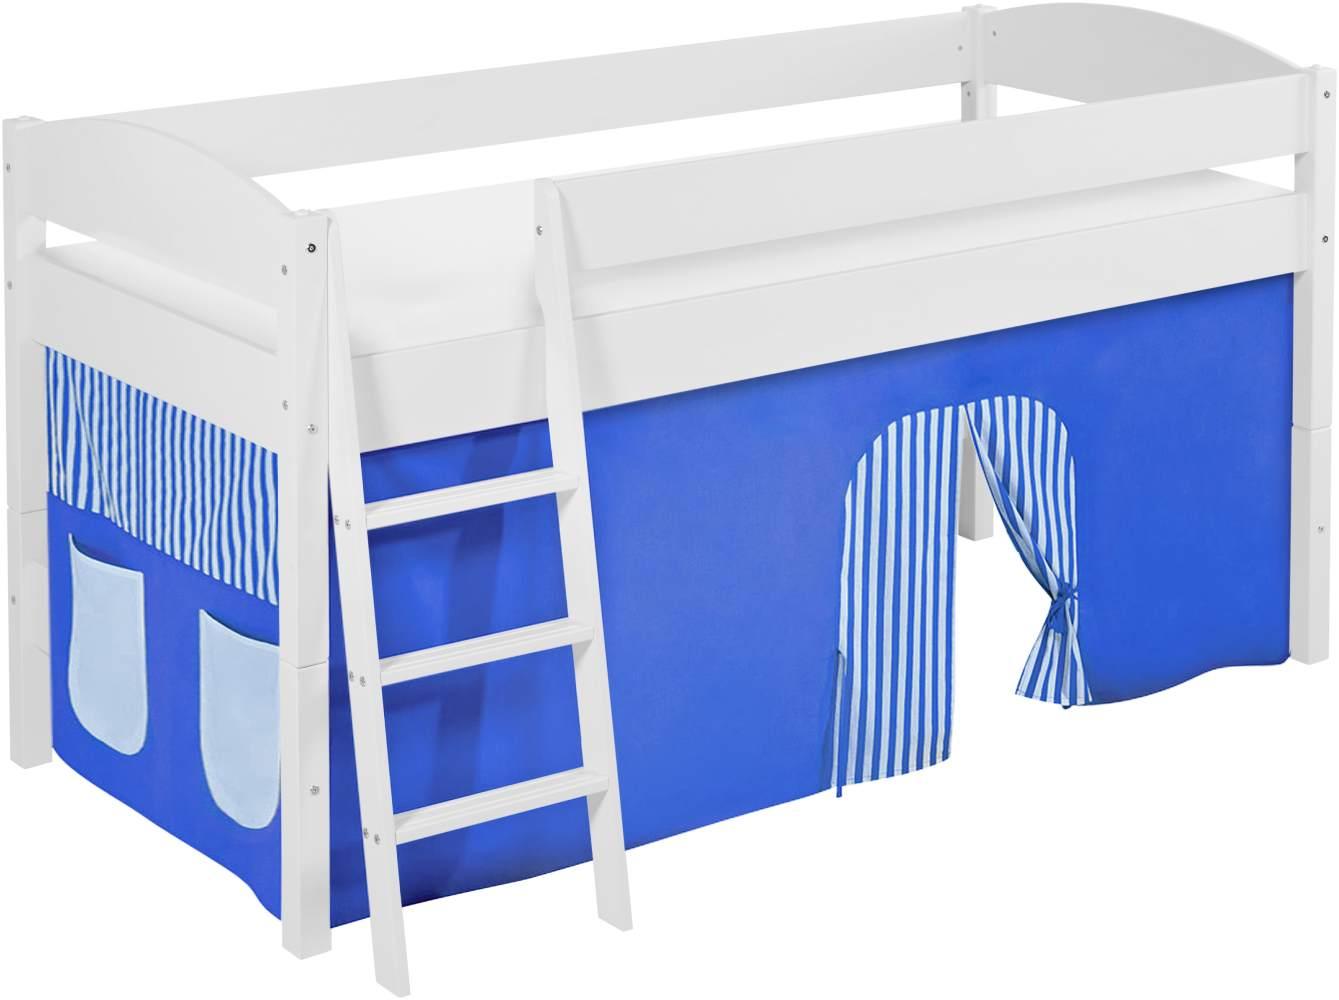 Lilokids 'Ida 4105' Spielbett 90 x 200 cm, Blau, Kiefer massiv, mit Vorhang Bild 1